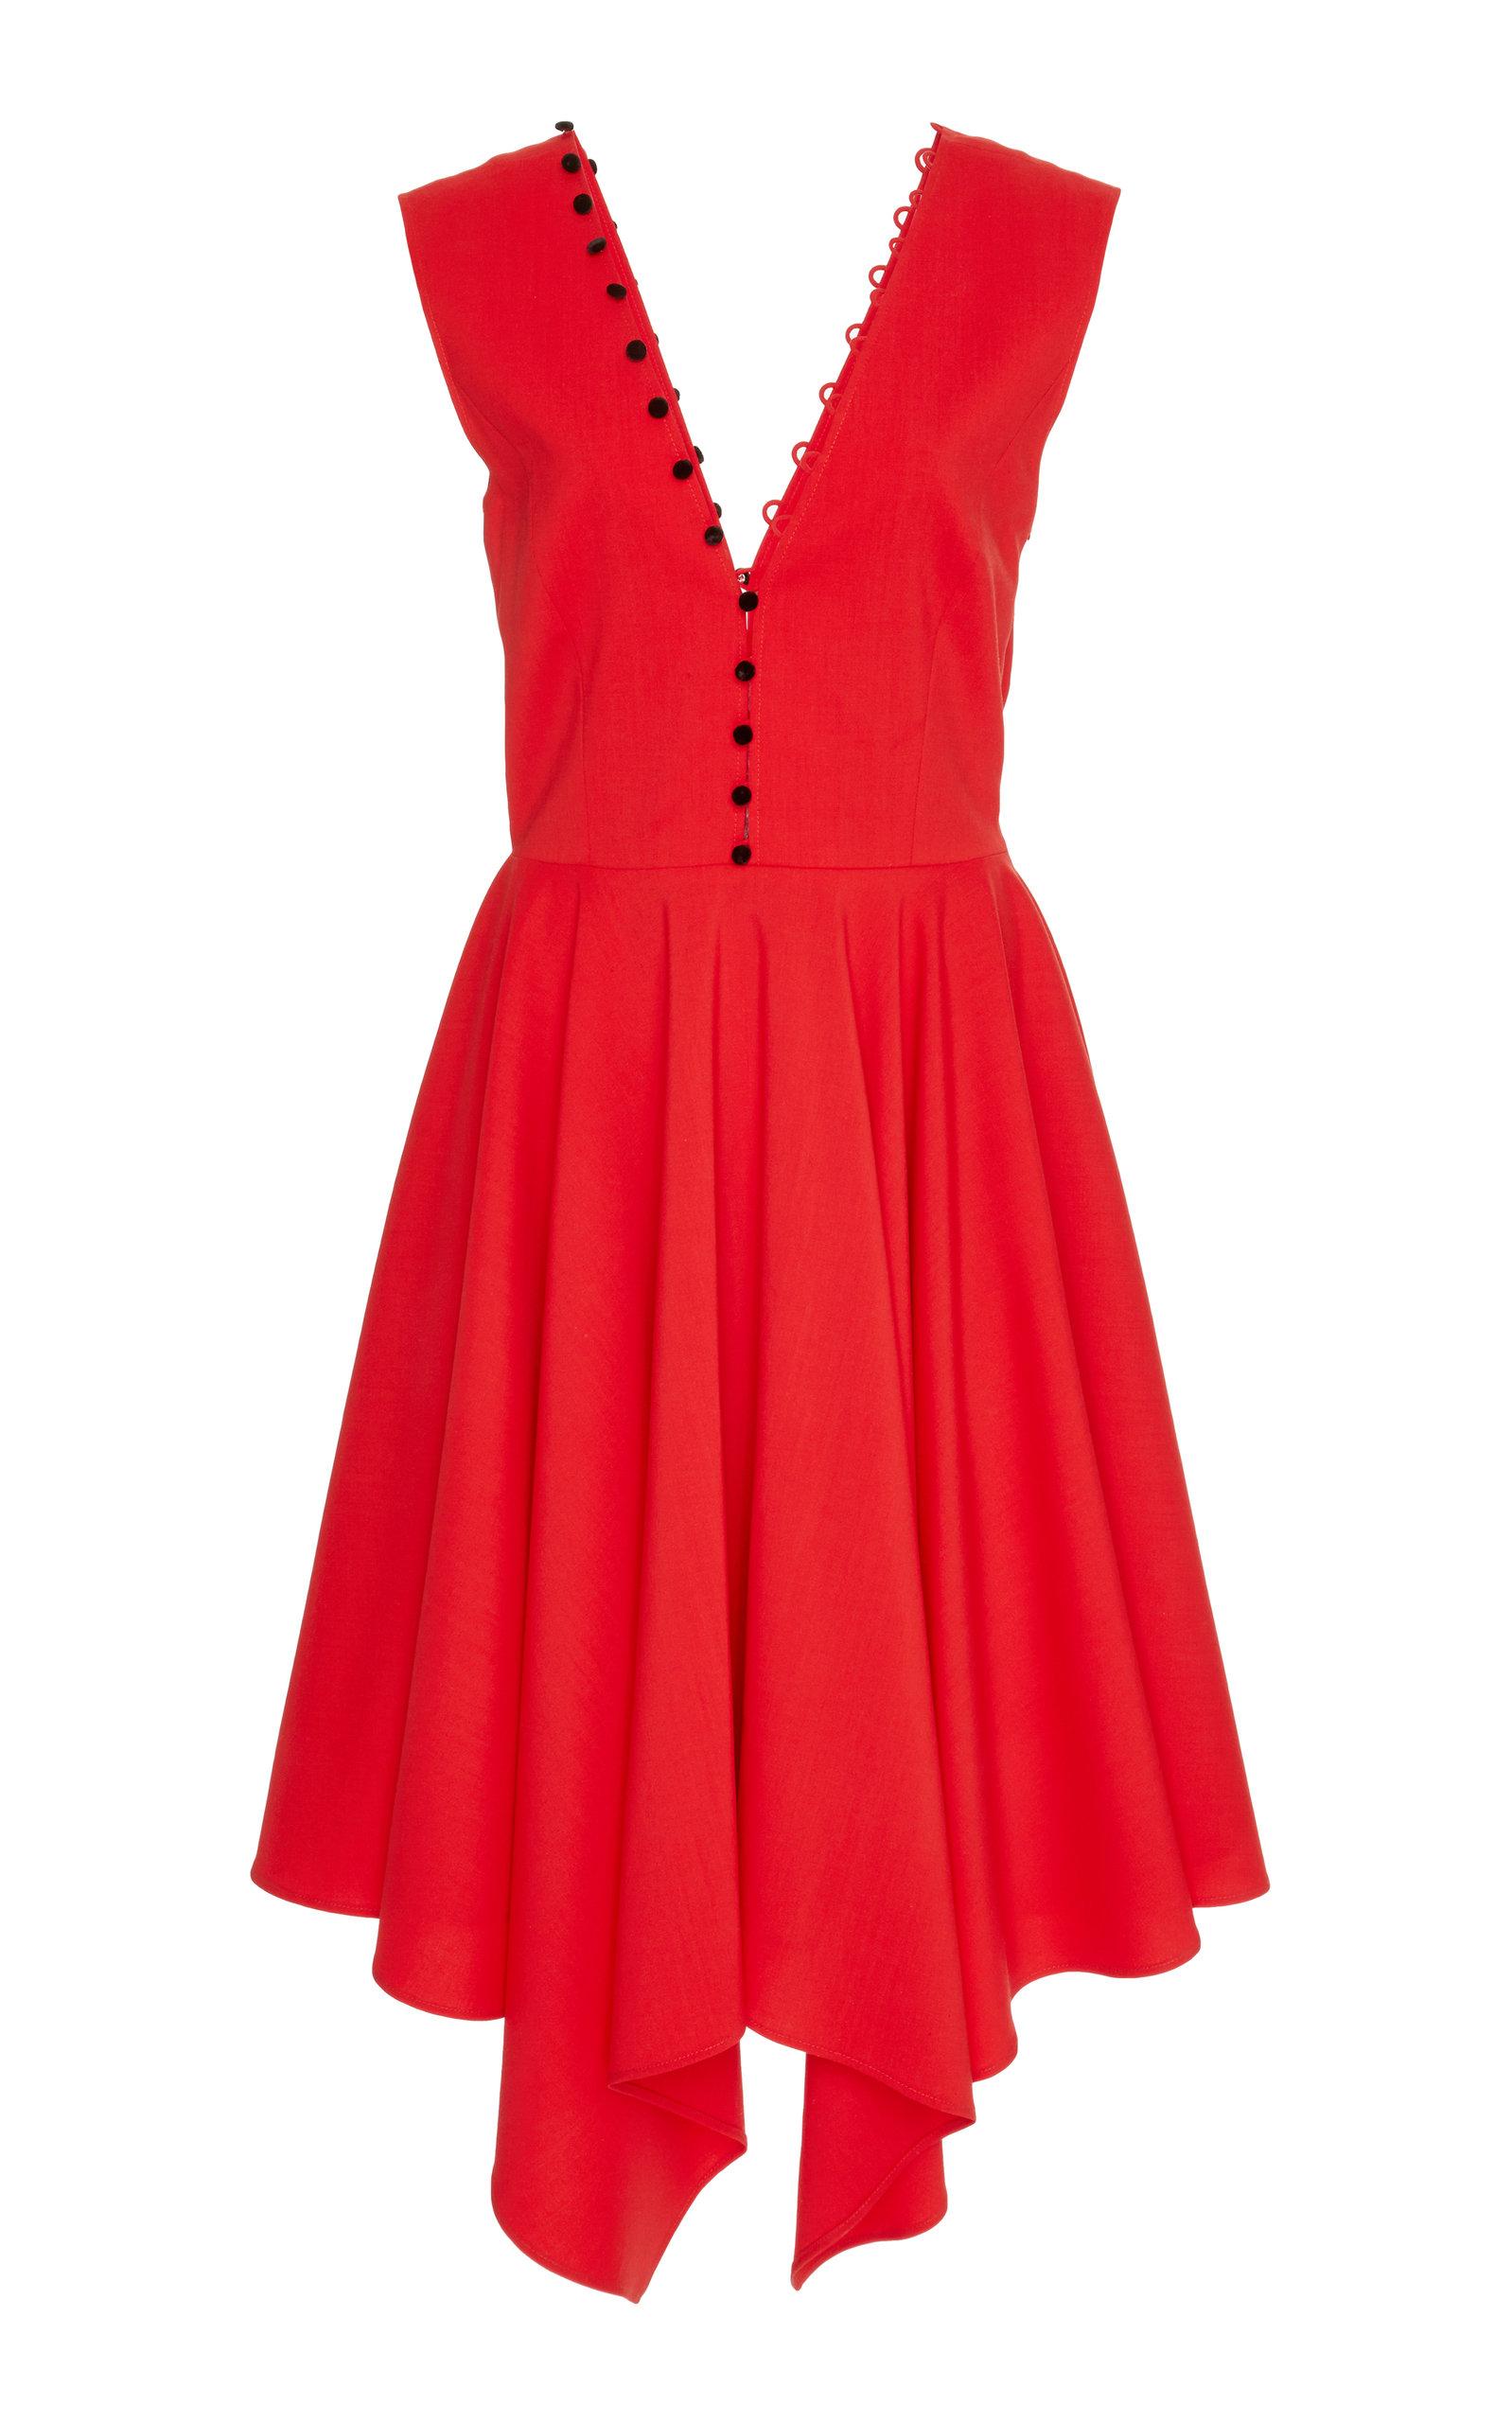 ADEAM Buttoned Handkerchief Dress in Red